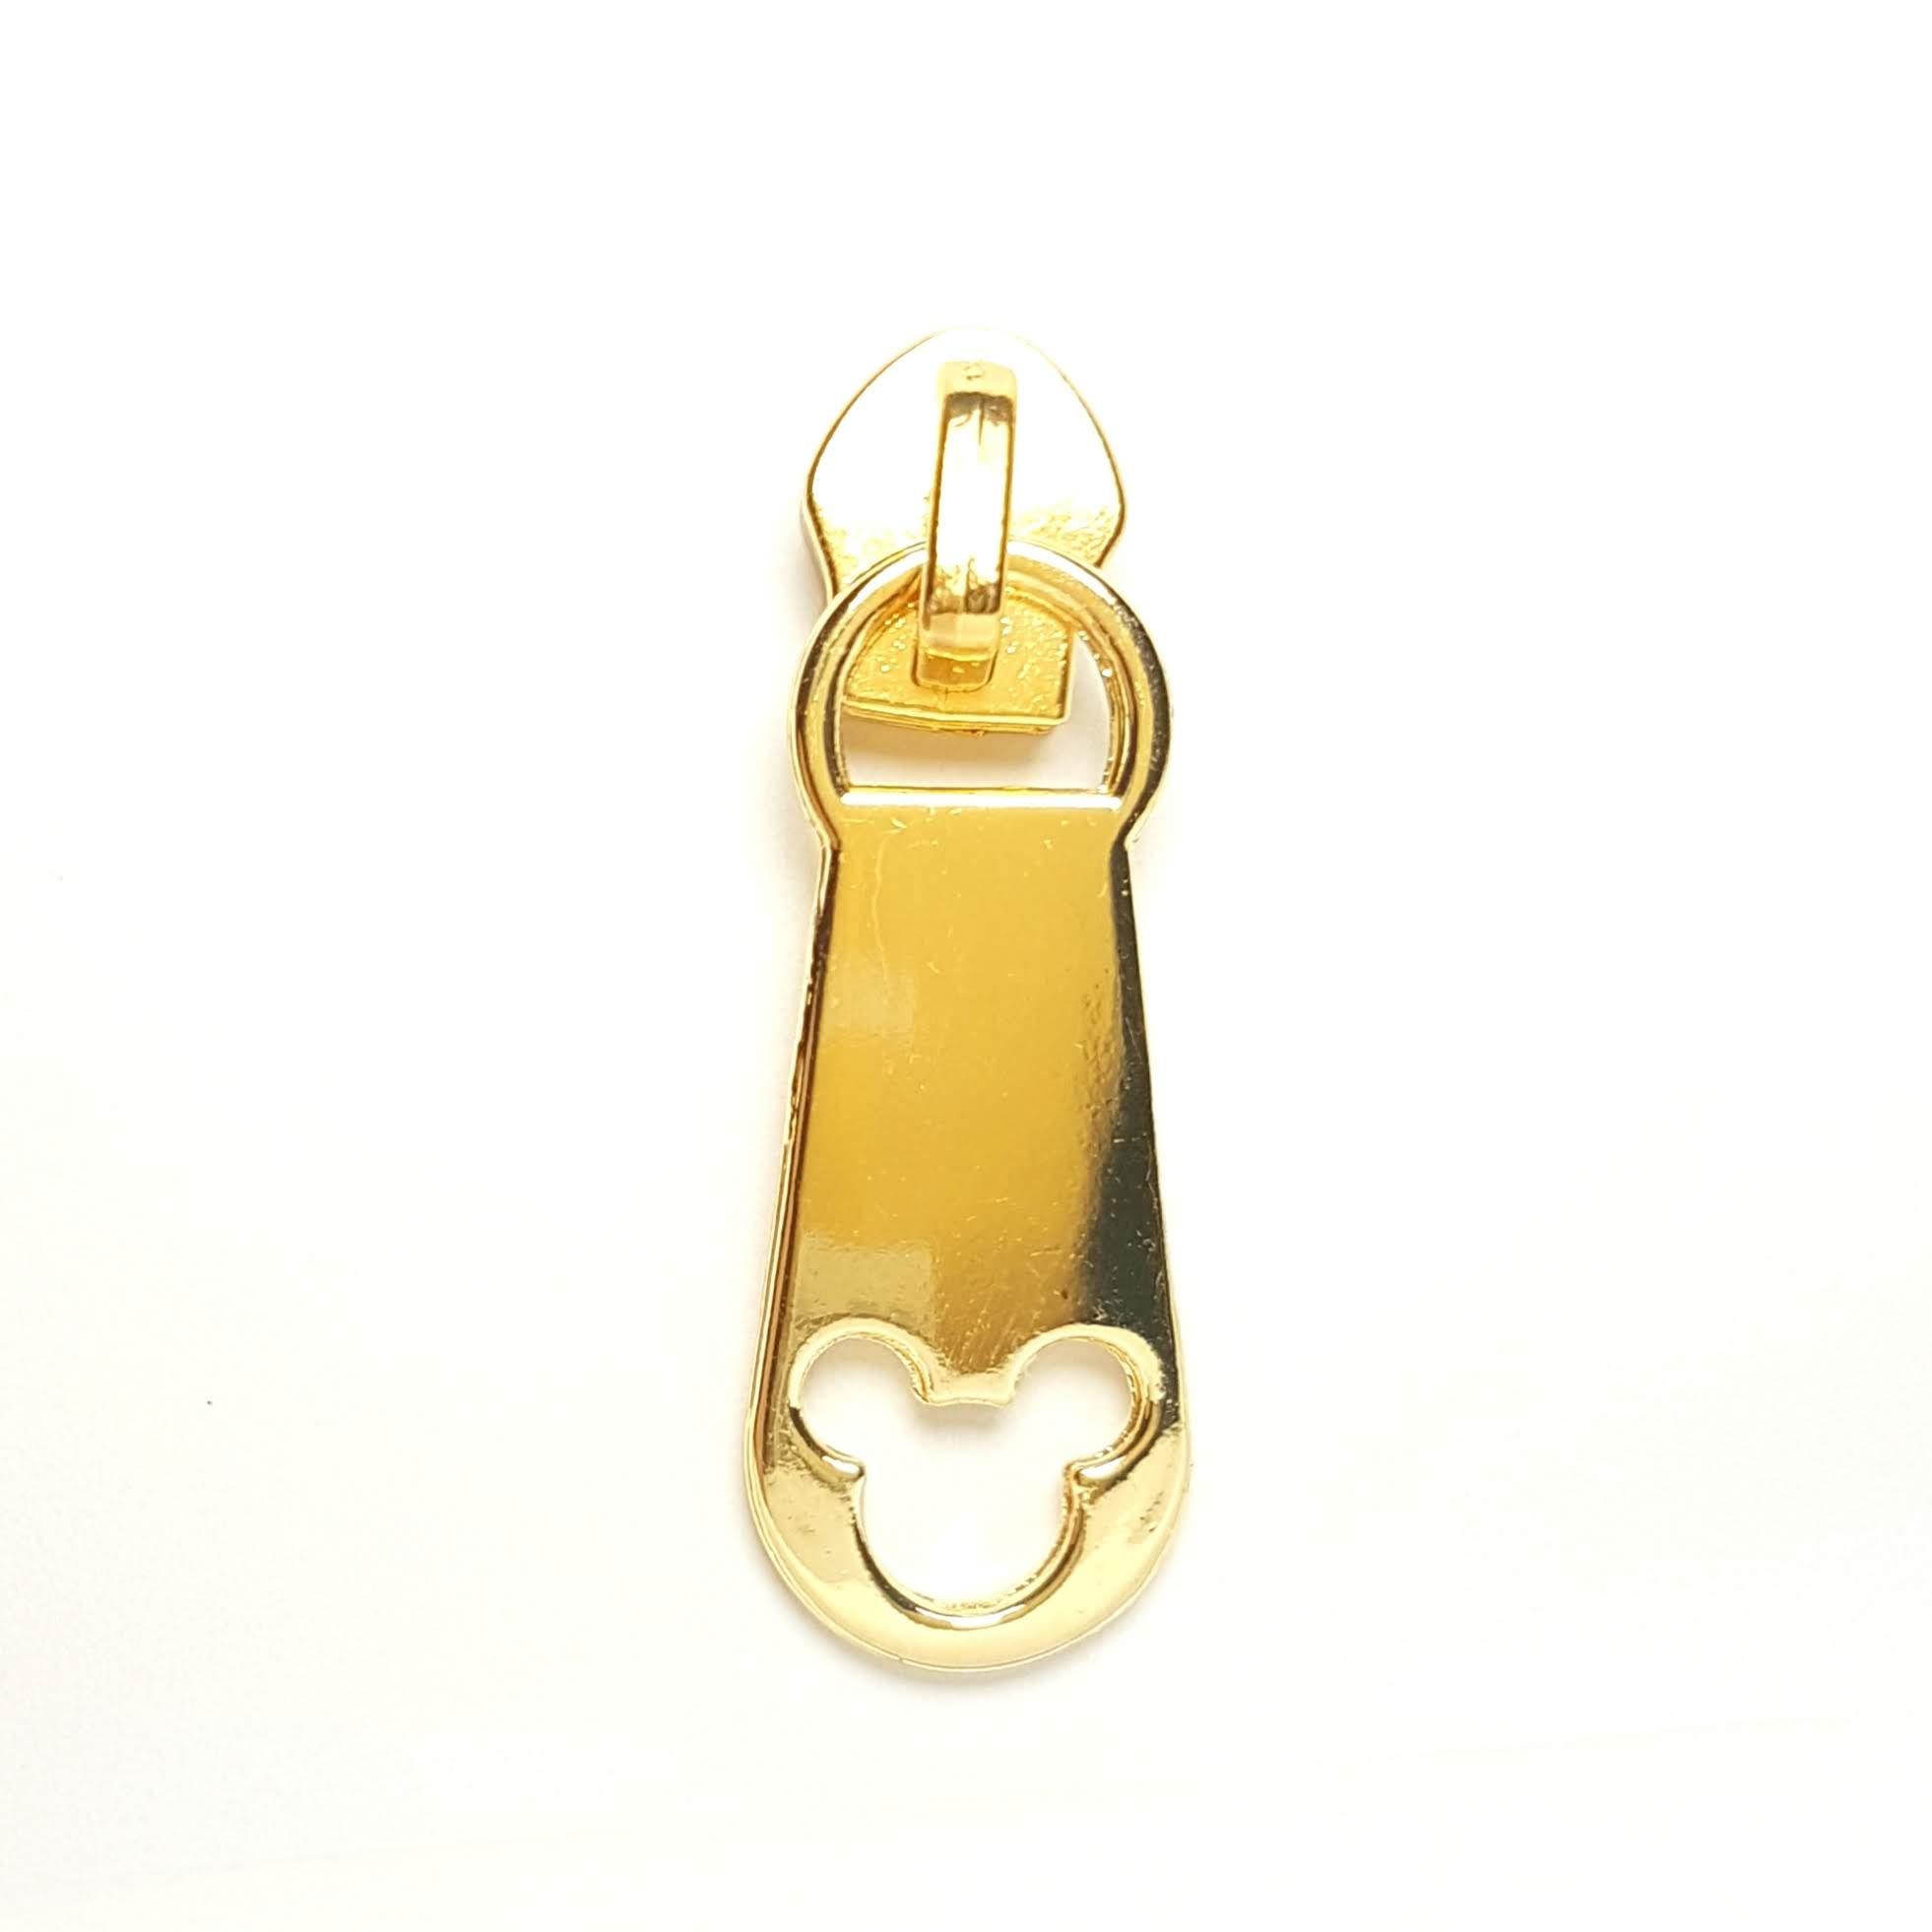 Cursor N.º 5 - Ref. 521 - Dourado Verniz